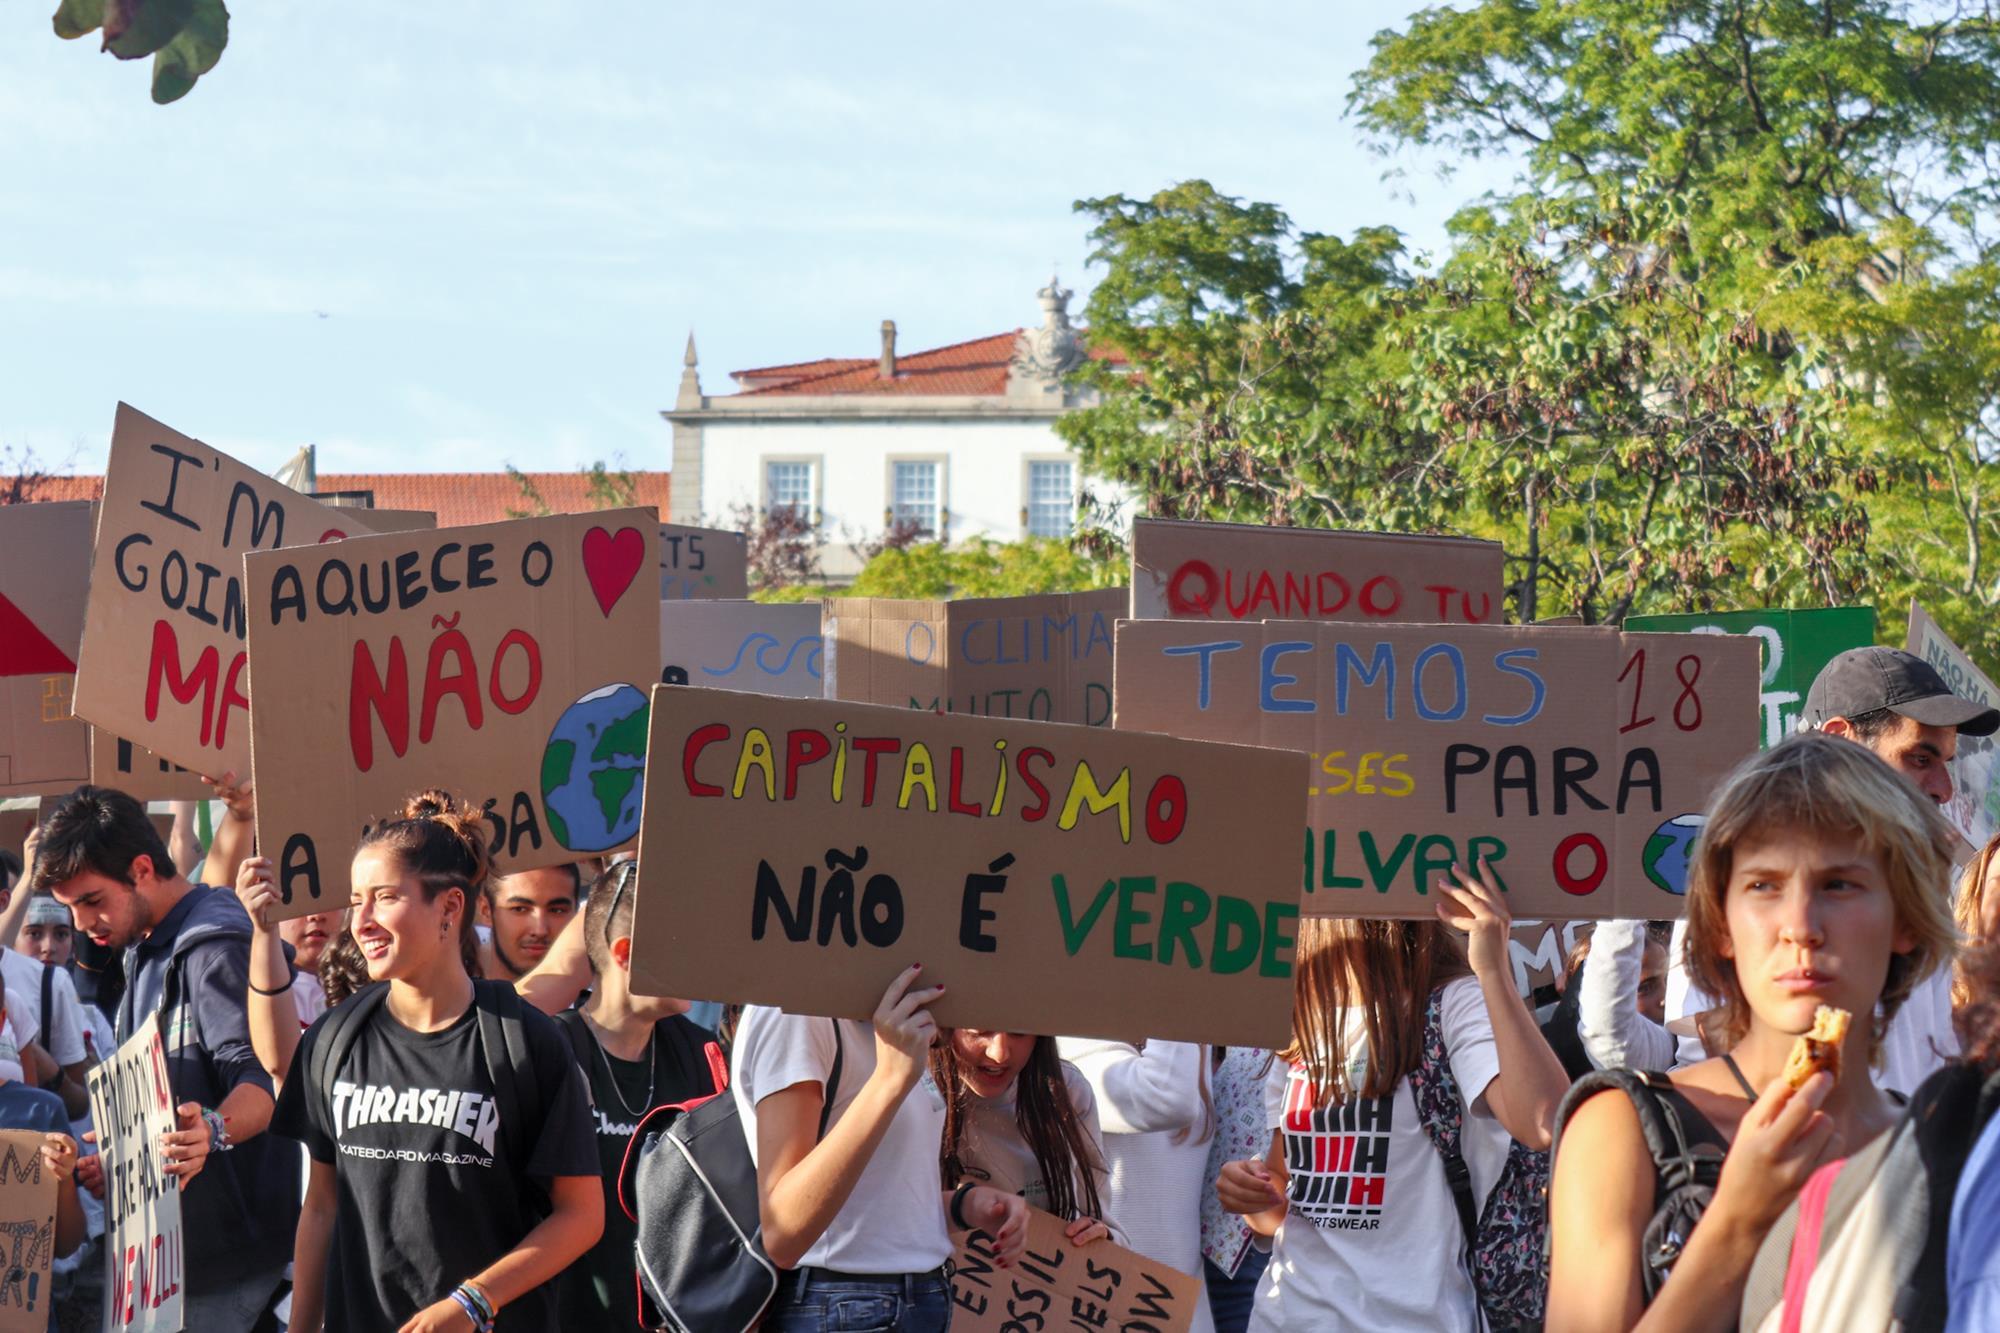 Fotografia de Salomé Santos.